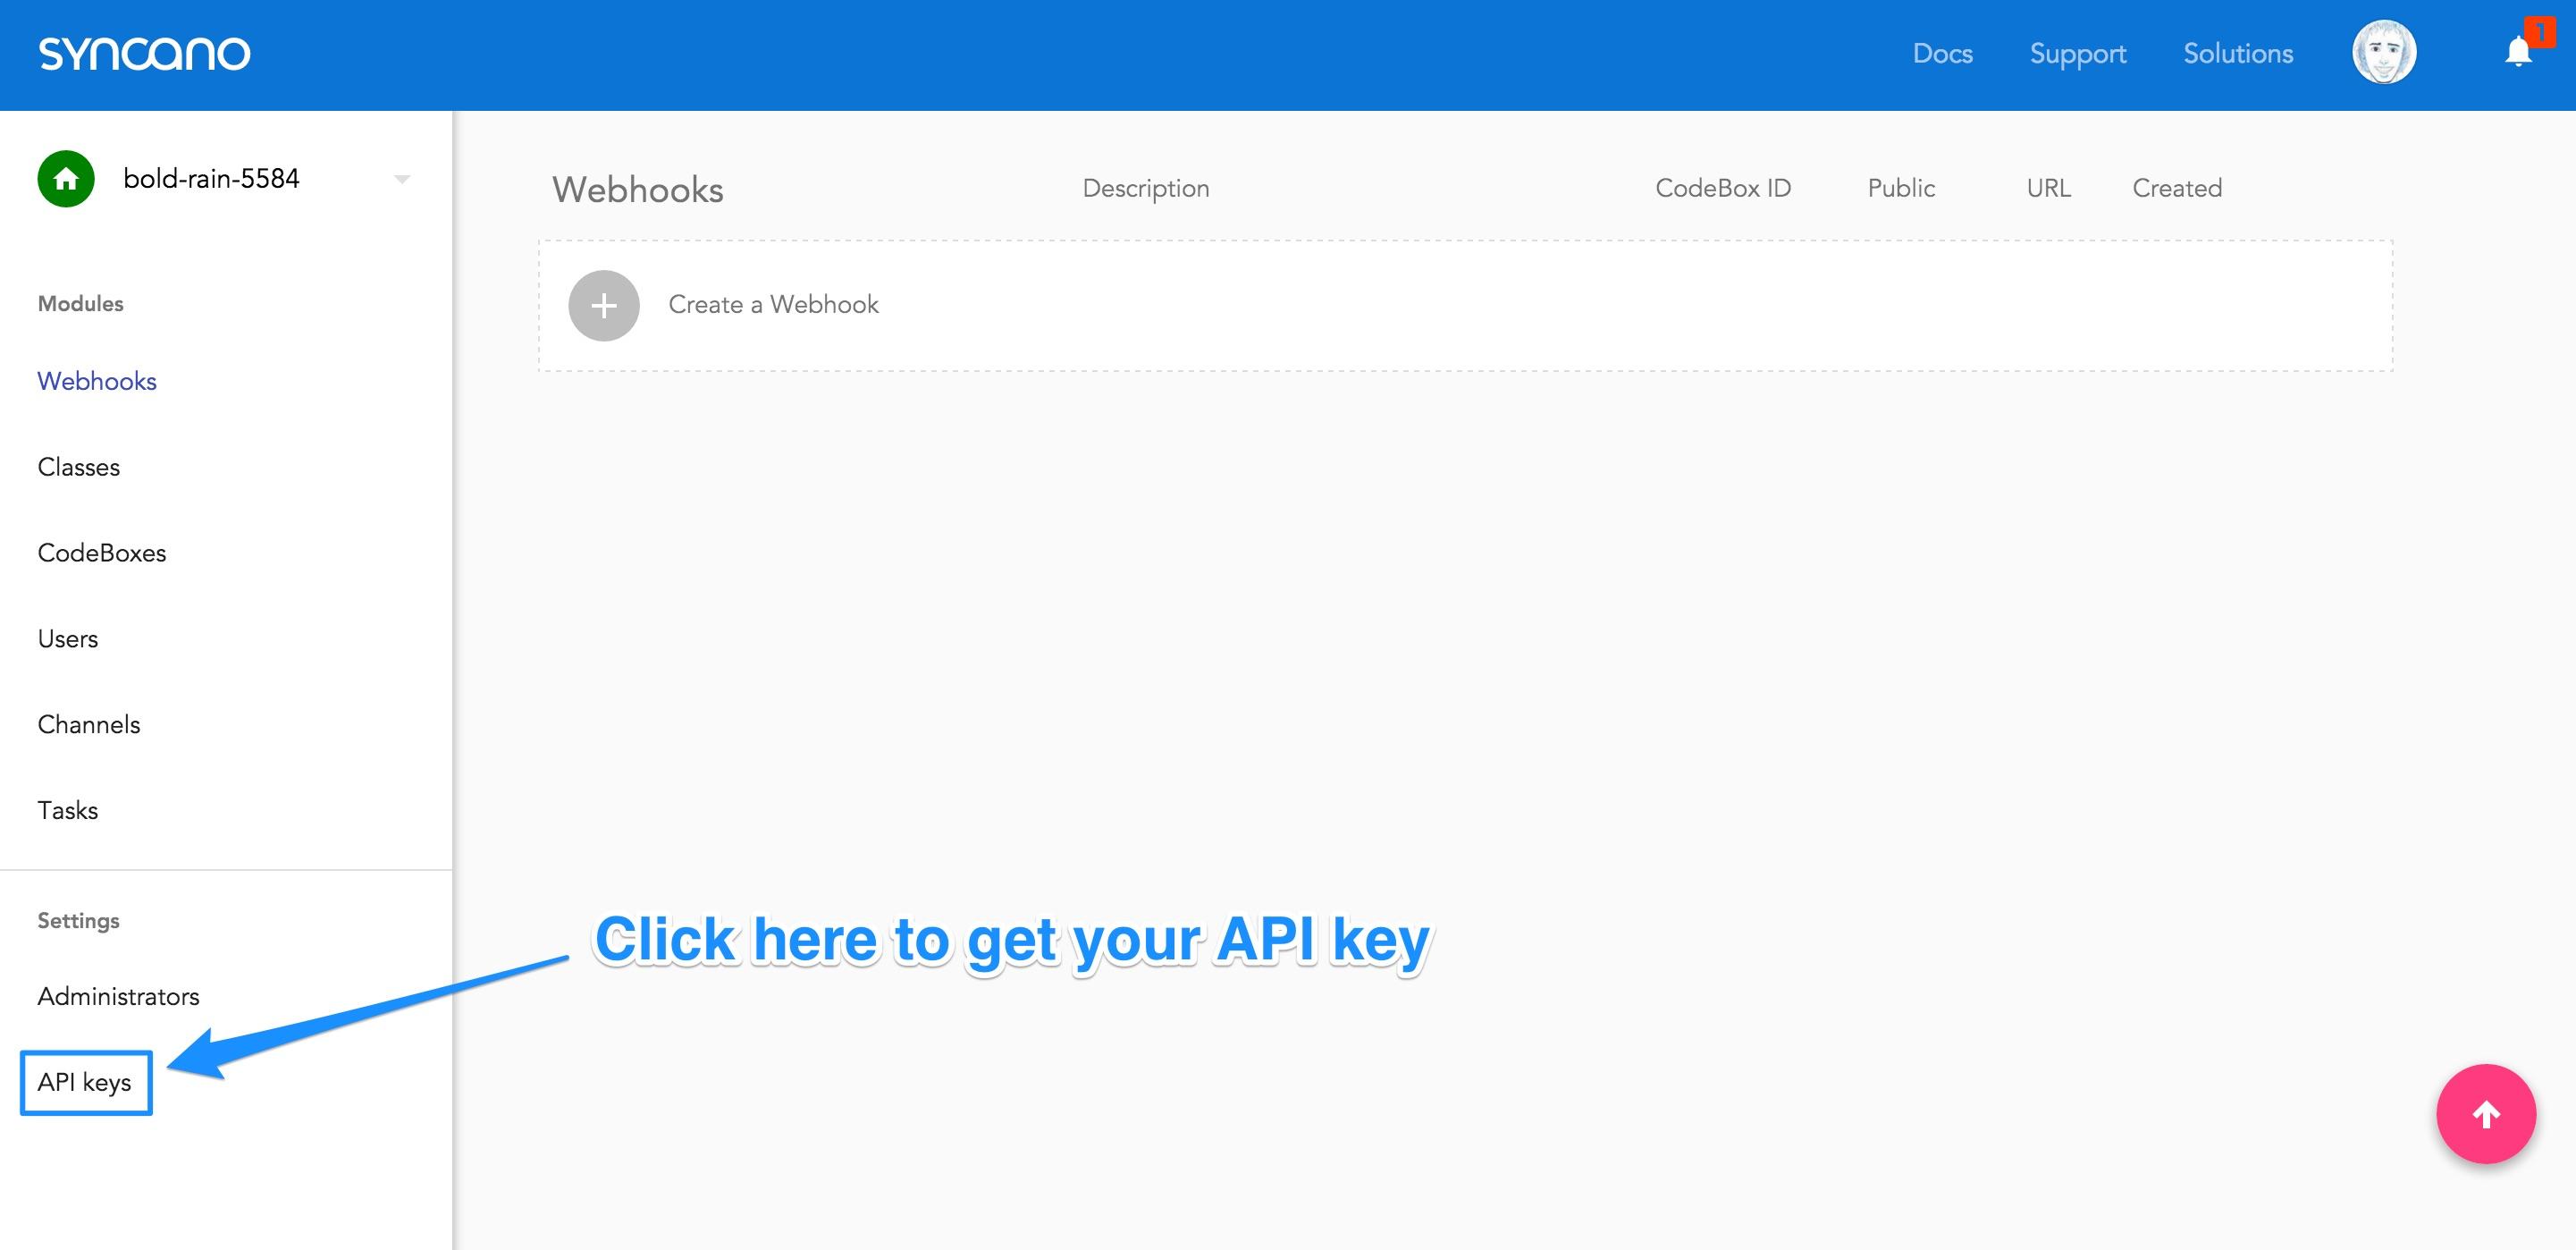 Going to the Get API Key screen